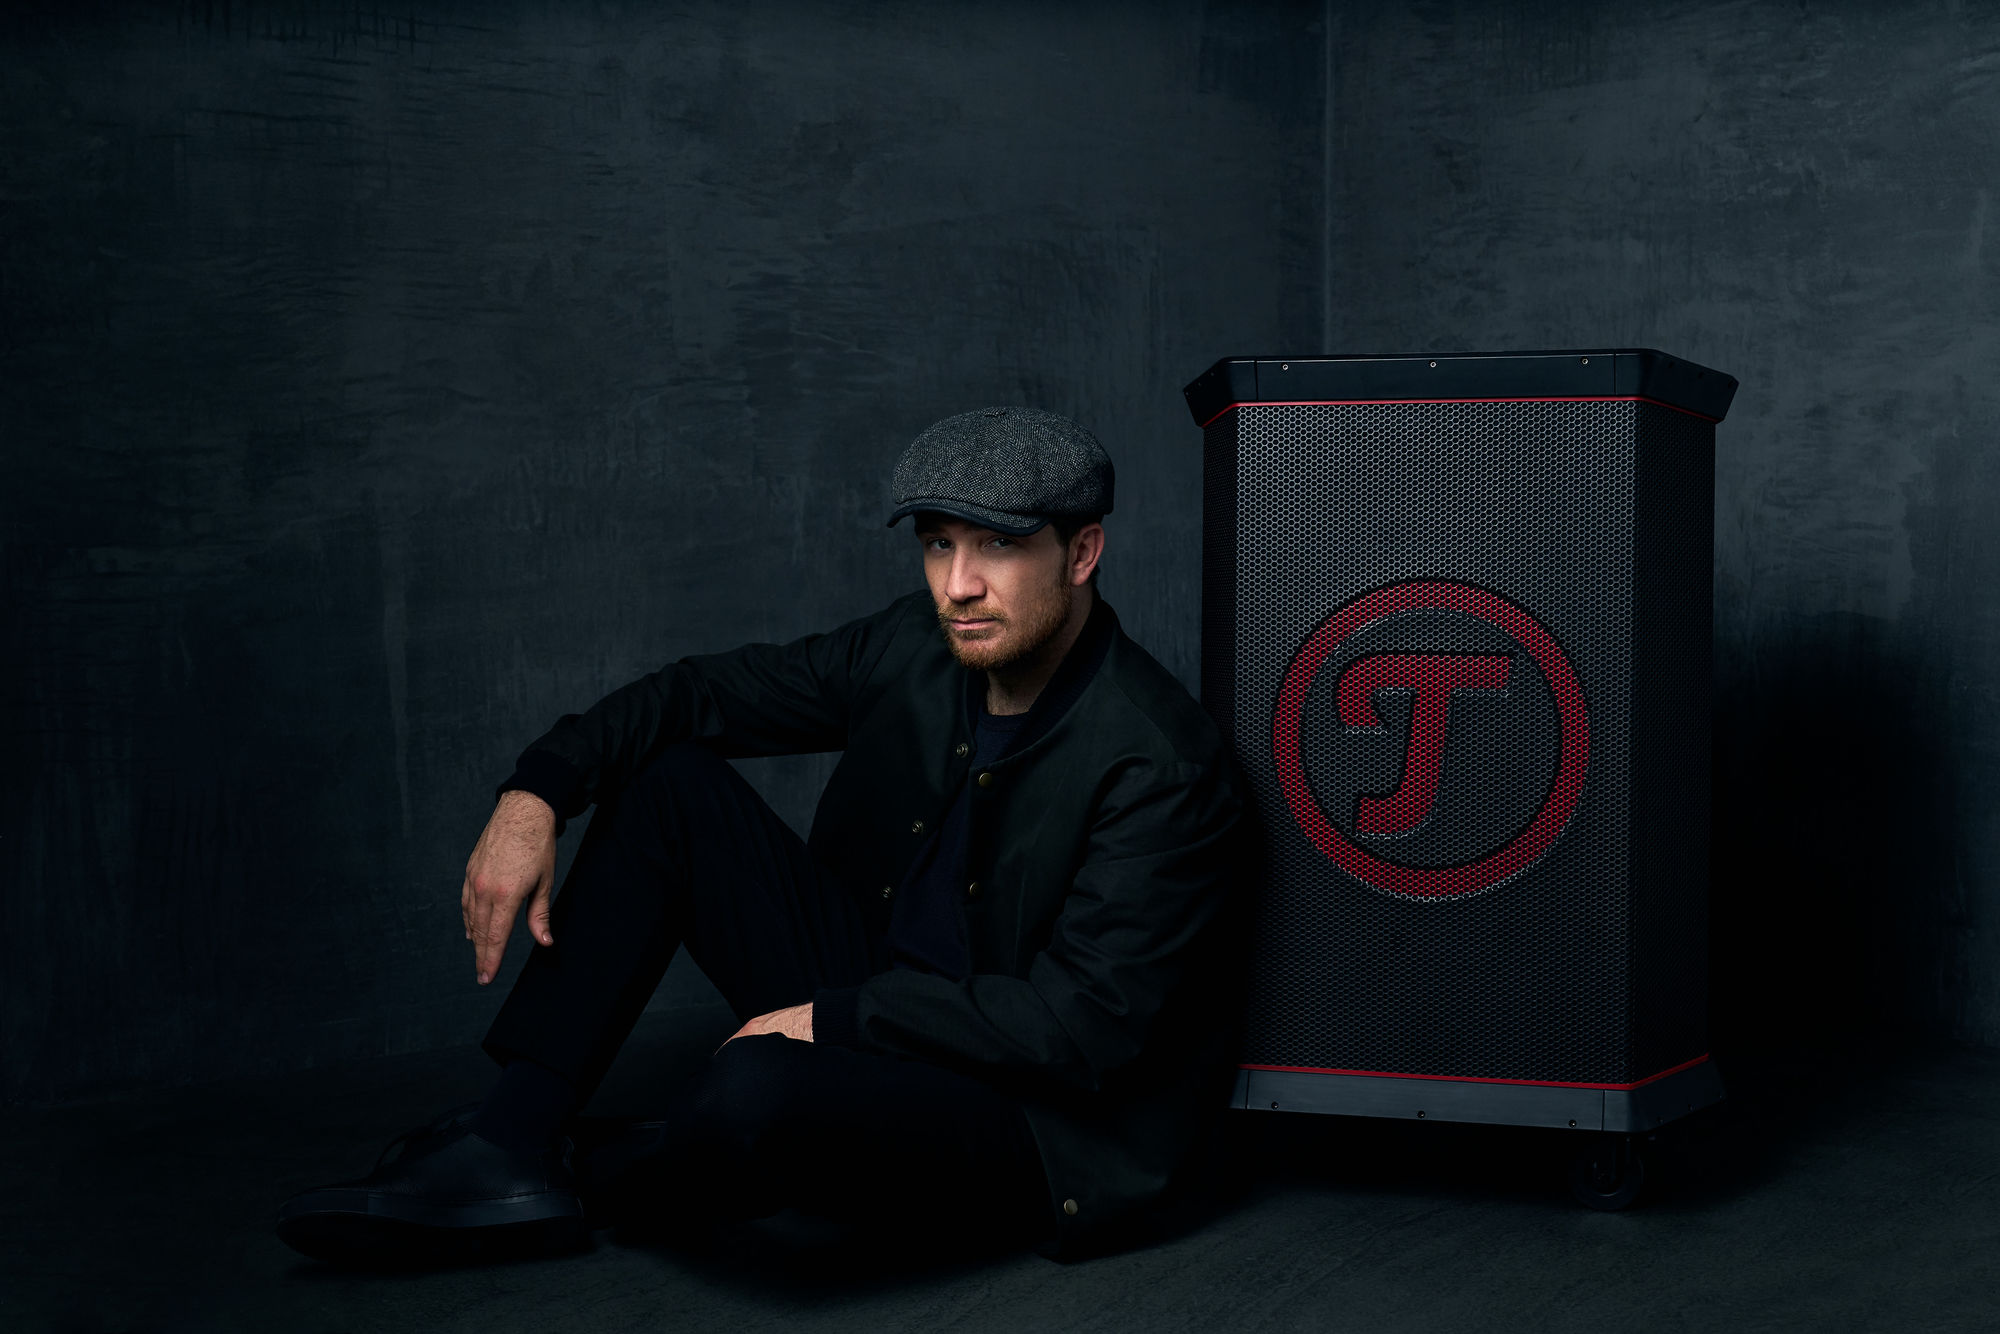 HAUSER FOTOGRAFEN: Tobias Schult with Frederick Lau for client TEUFEL